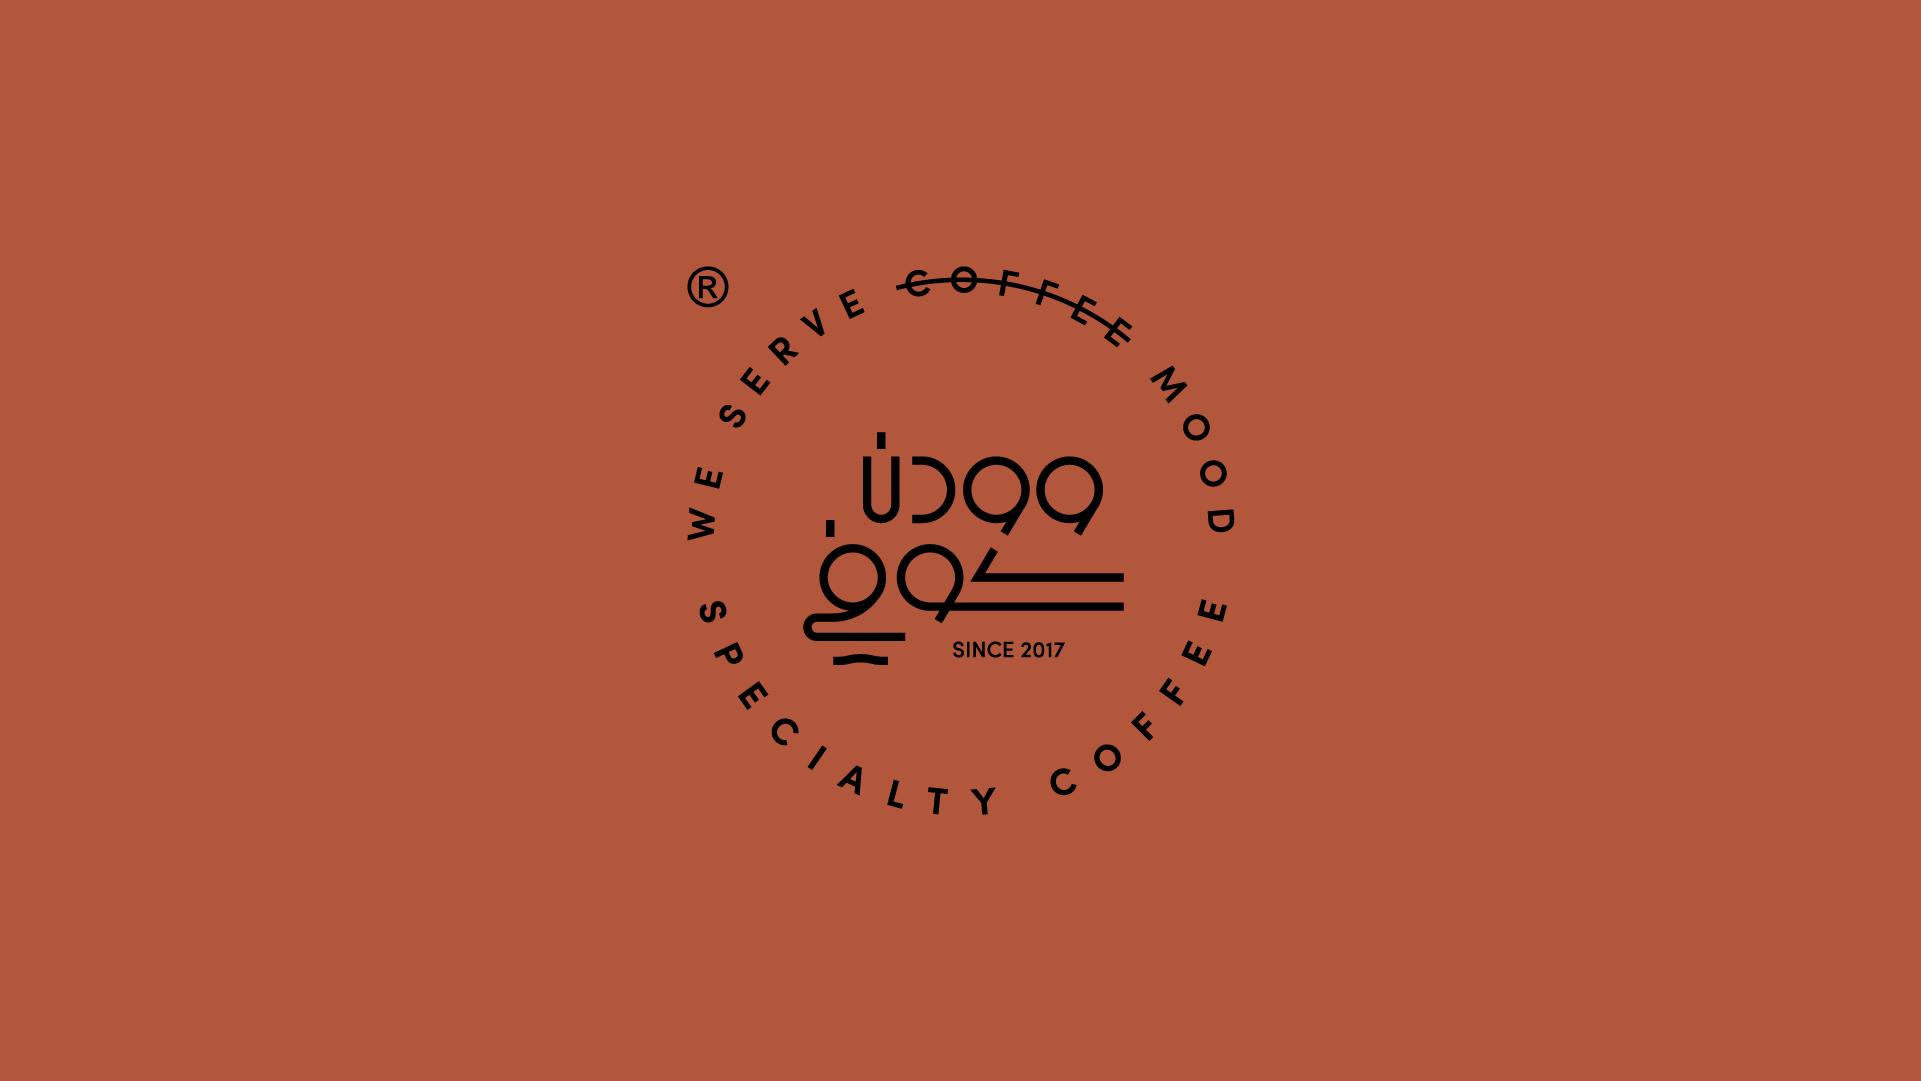 Logo-WoodenCoffee-Work-by-YaStudio-8